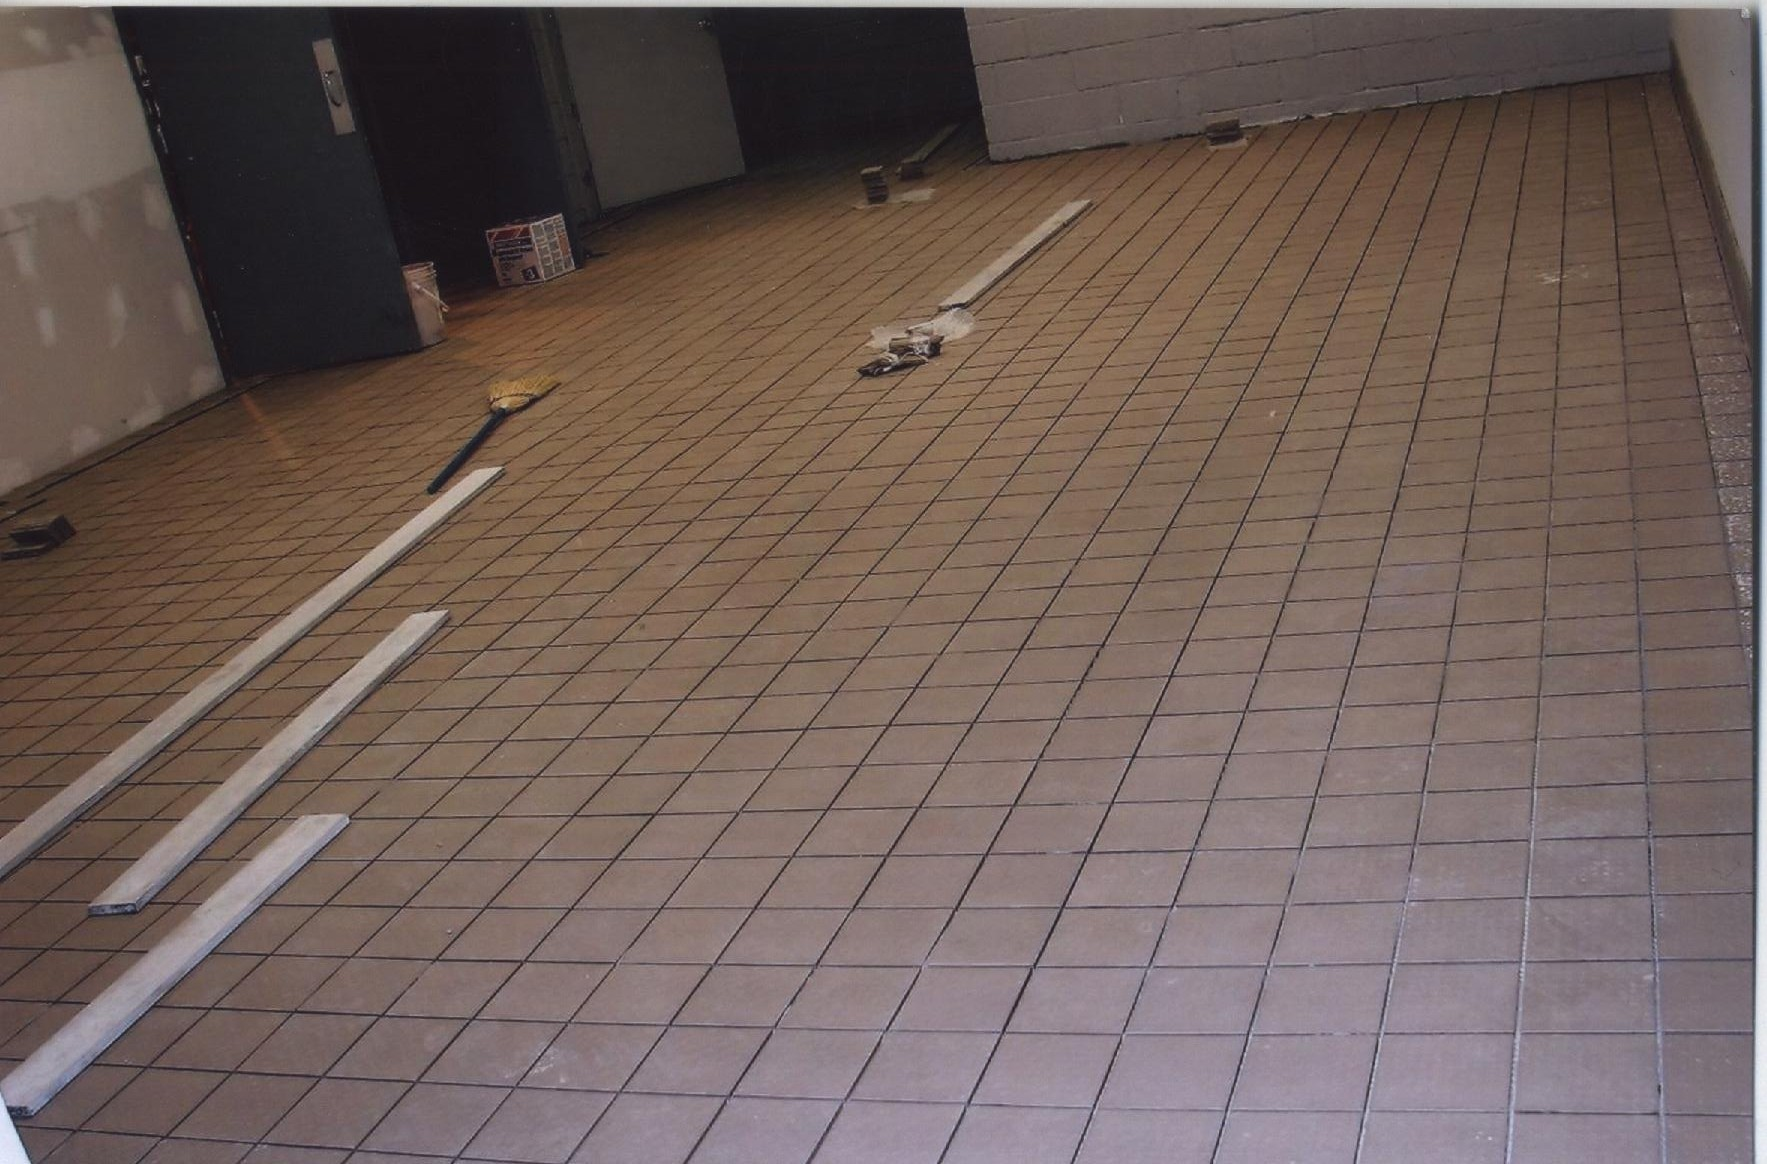 Commercial kitchen tile flooring